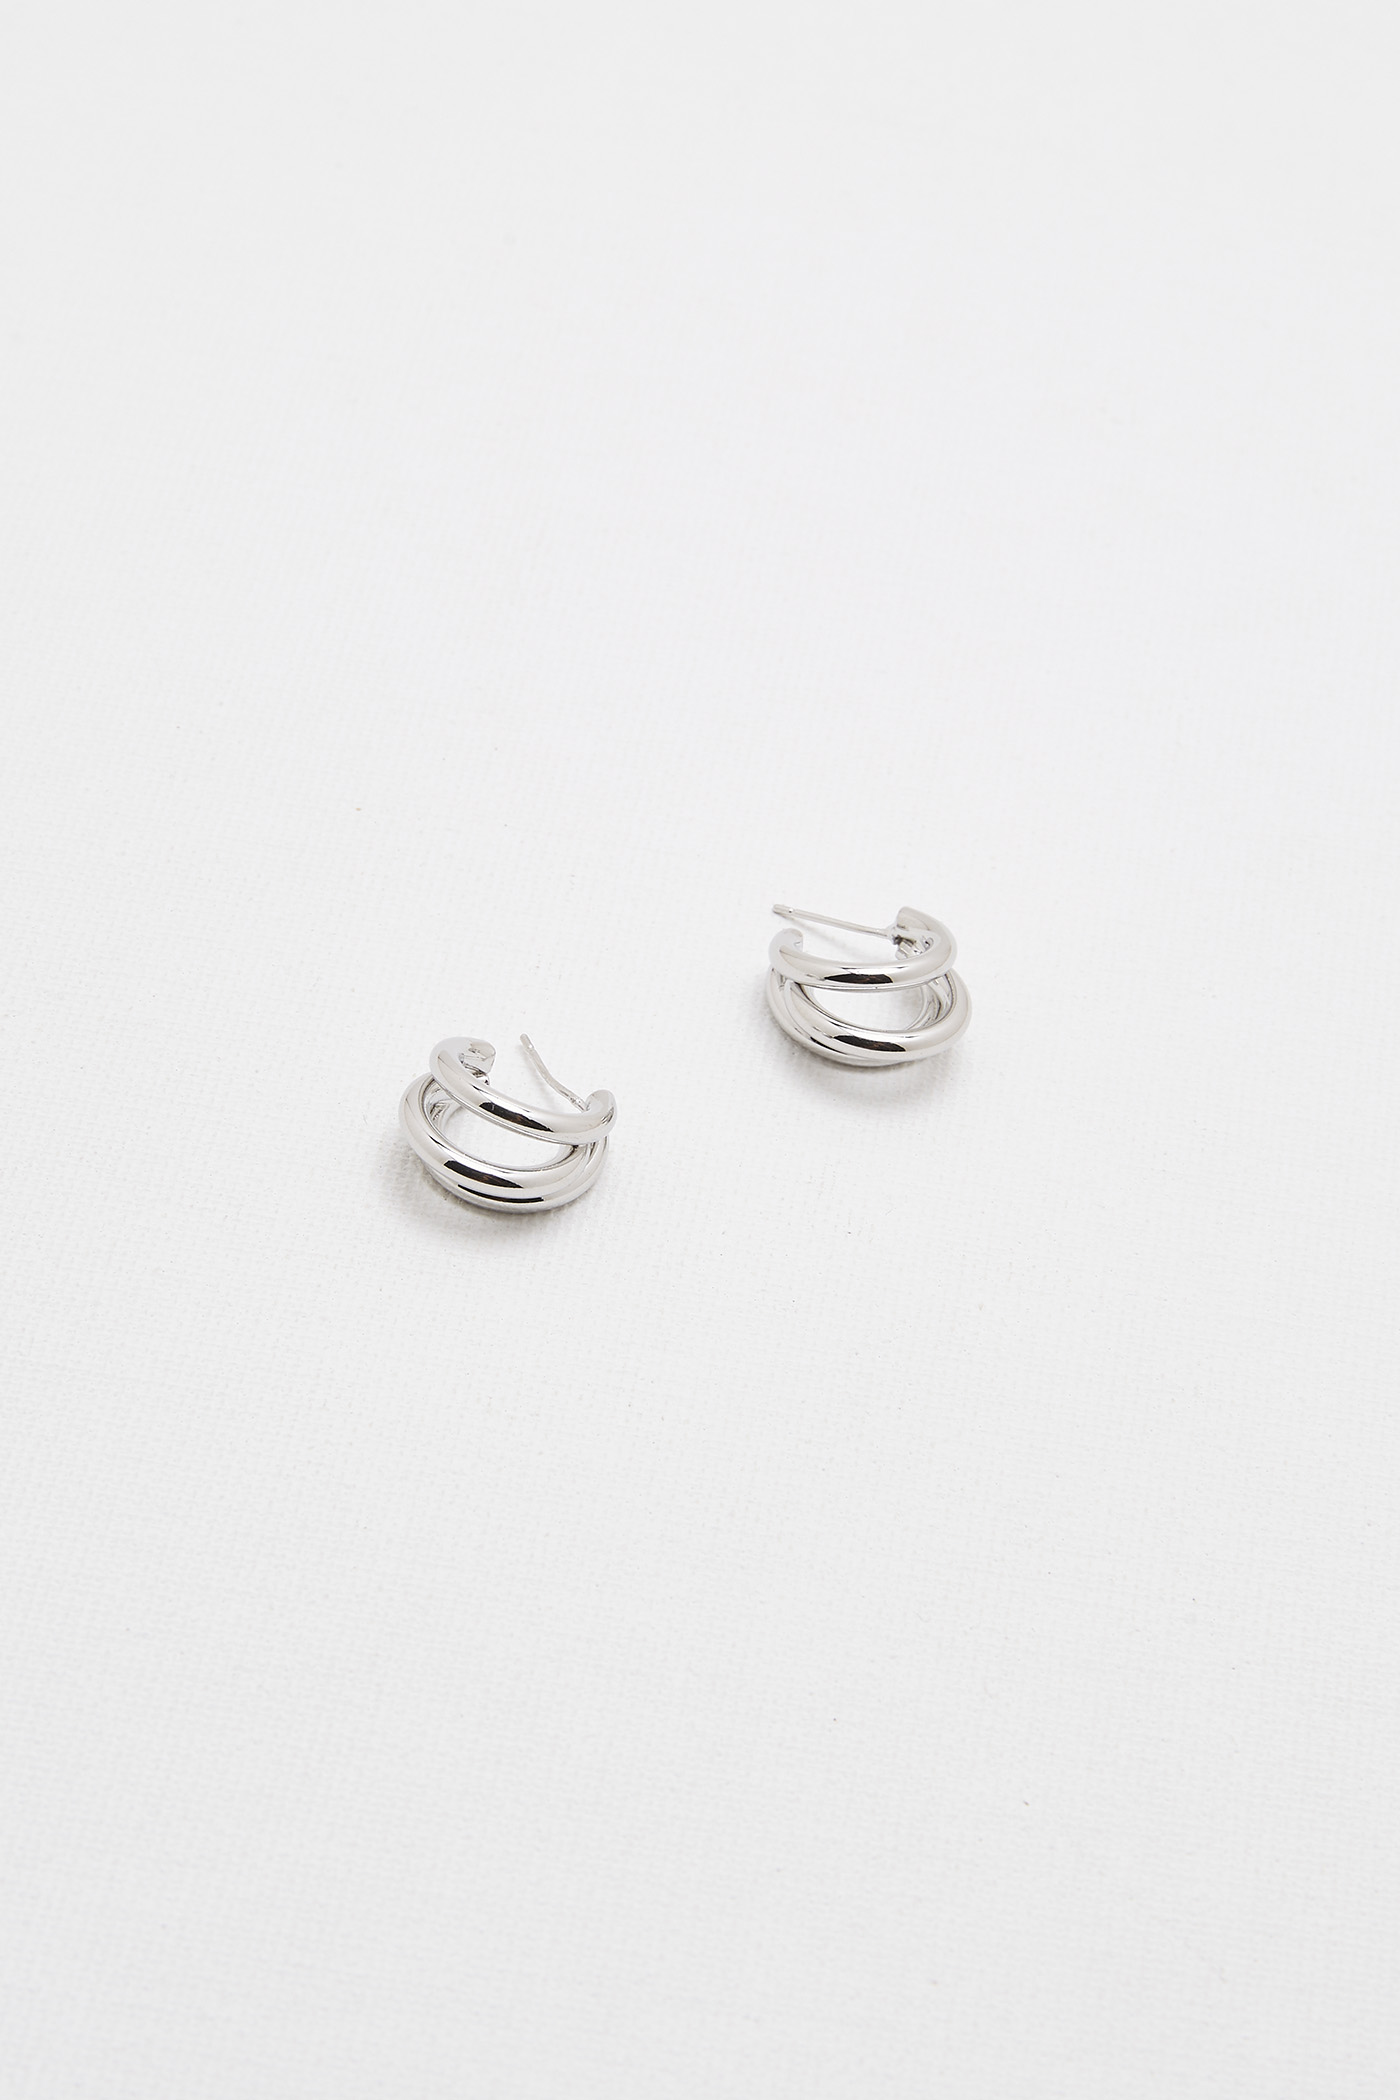 Saylor Earrings